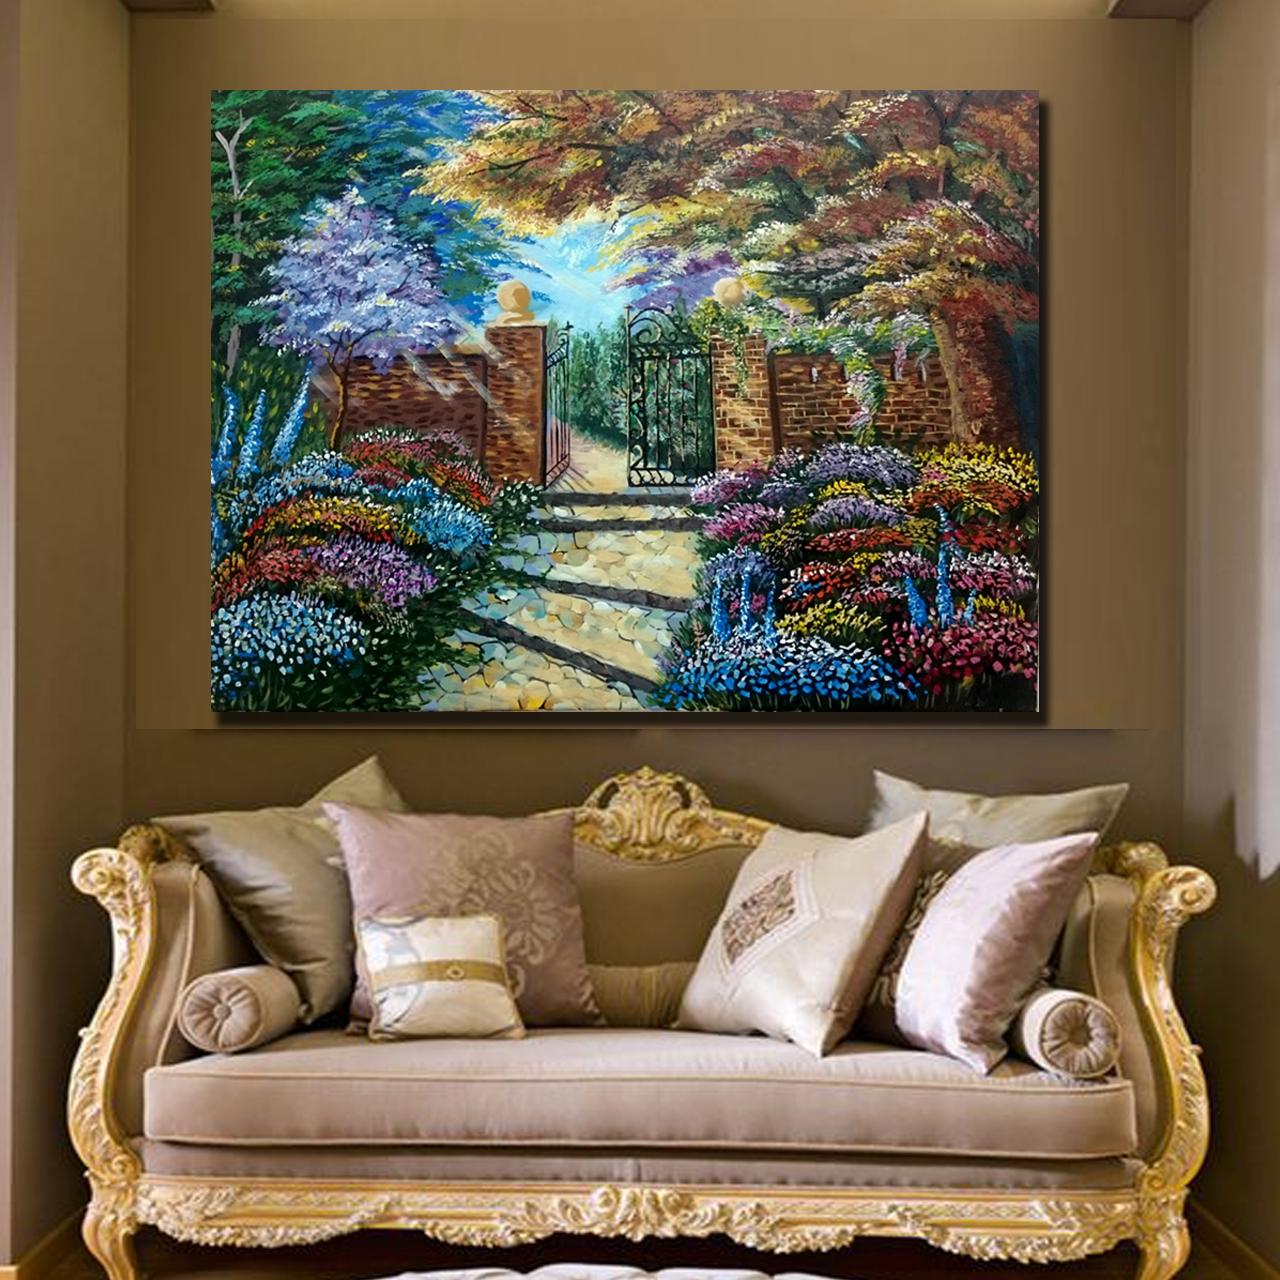 خرید                      تابلو نقاشی اکریلیک طرح باغ گلها کد 0059